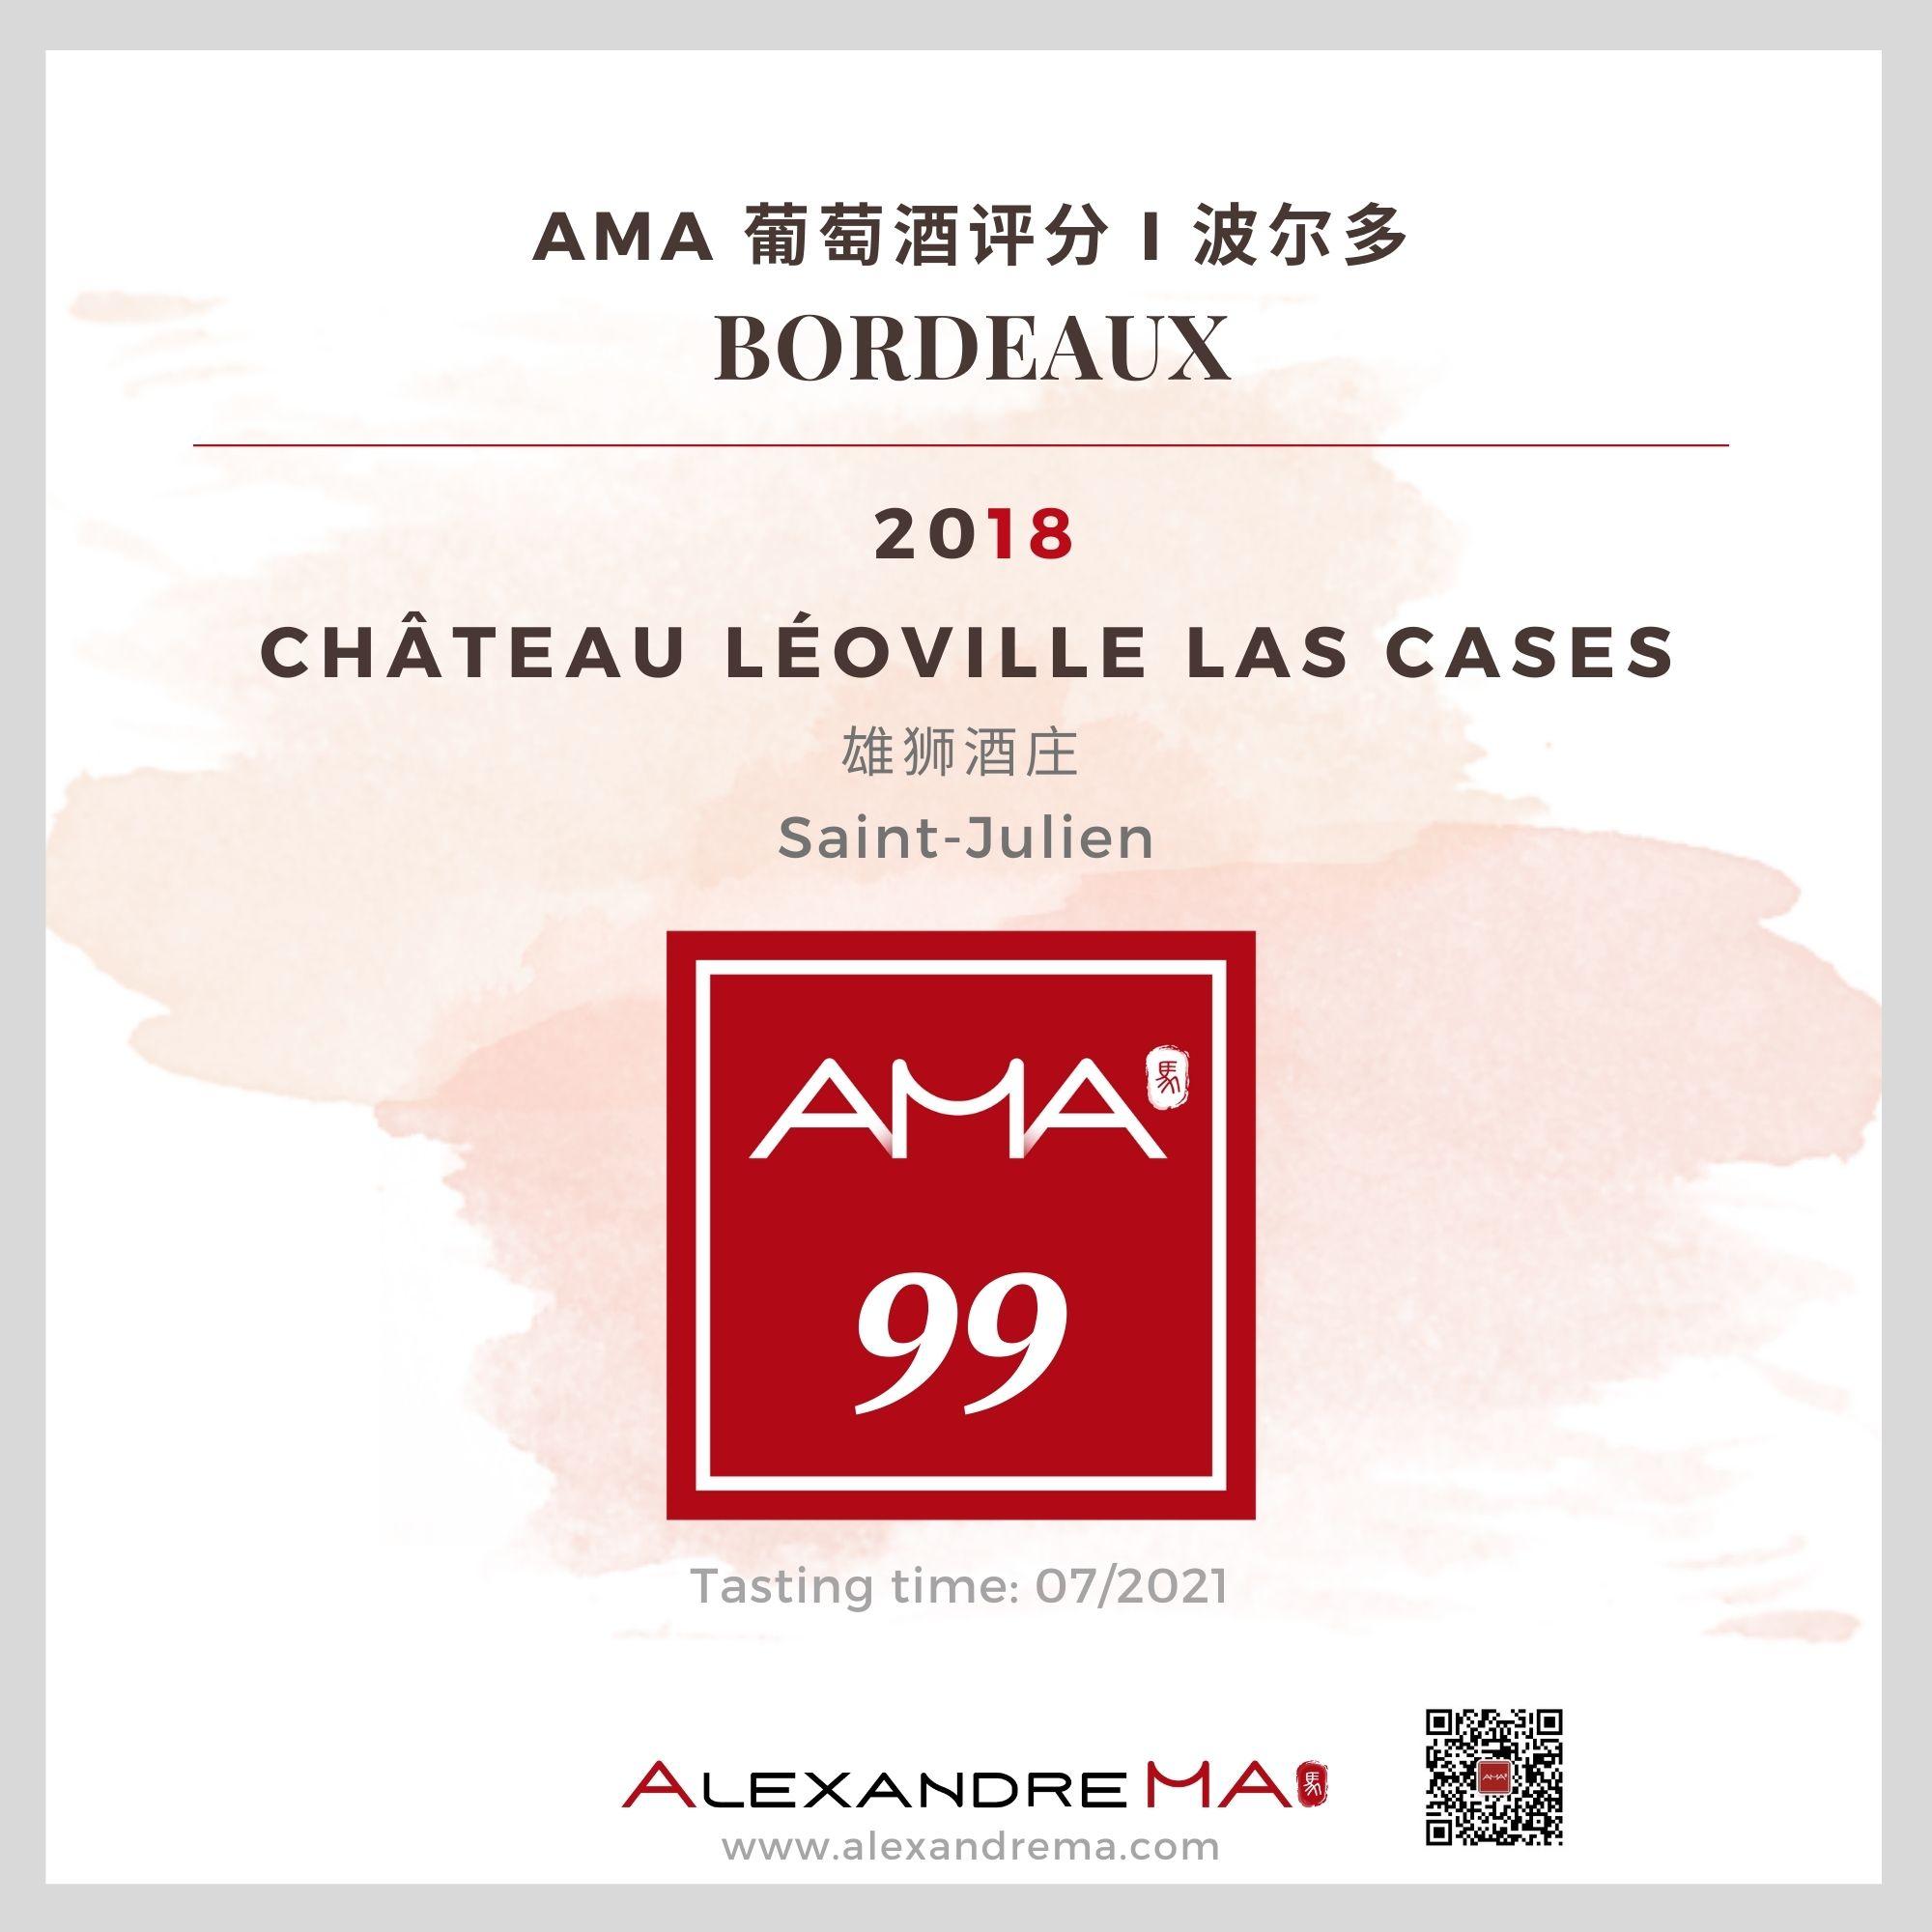 Château Léoville Las Cases 2018 雄狮酒庄 - Alexandre Ma